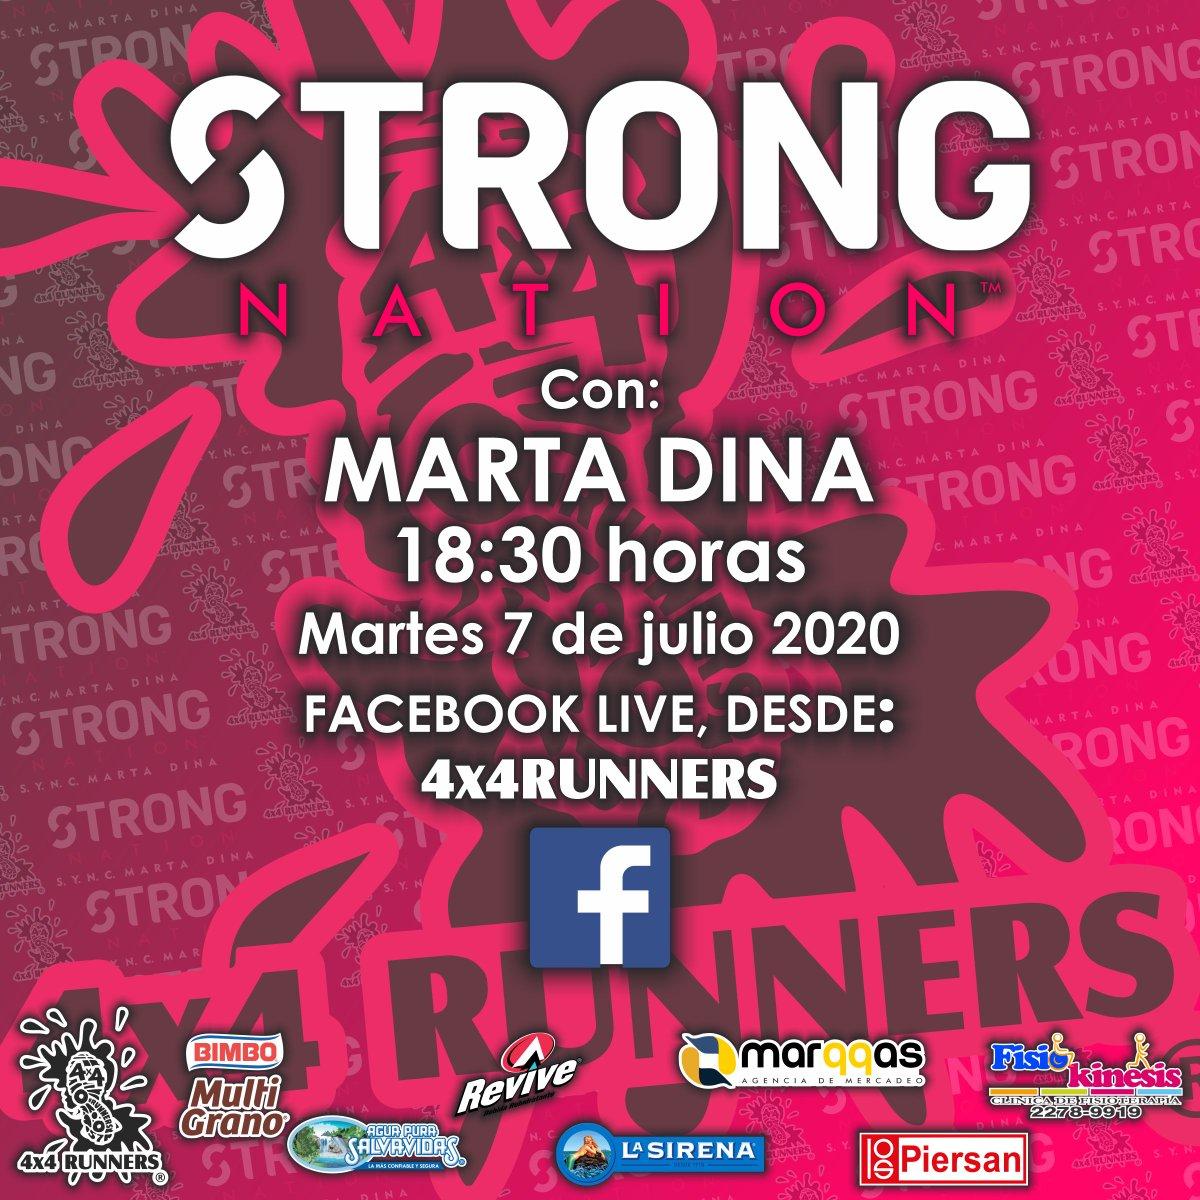 #QuedateEnCasa #EjercitateEnCasa #somos4x4runners #JuntosSaldremosAdelanteGuatemala #ArribaLosCorazones #4x4runners #KeepRunning #StrongNation #StrongNationbyMartaDinapic.twitter.com/KAFfObR9rR